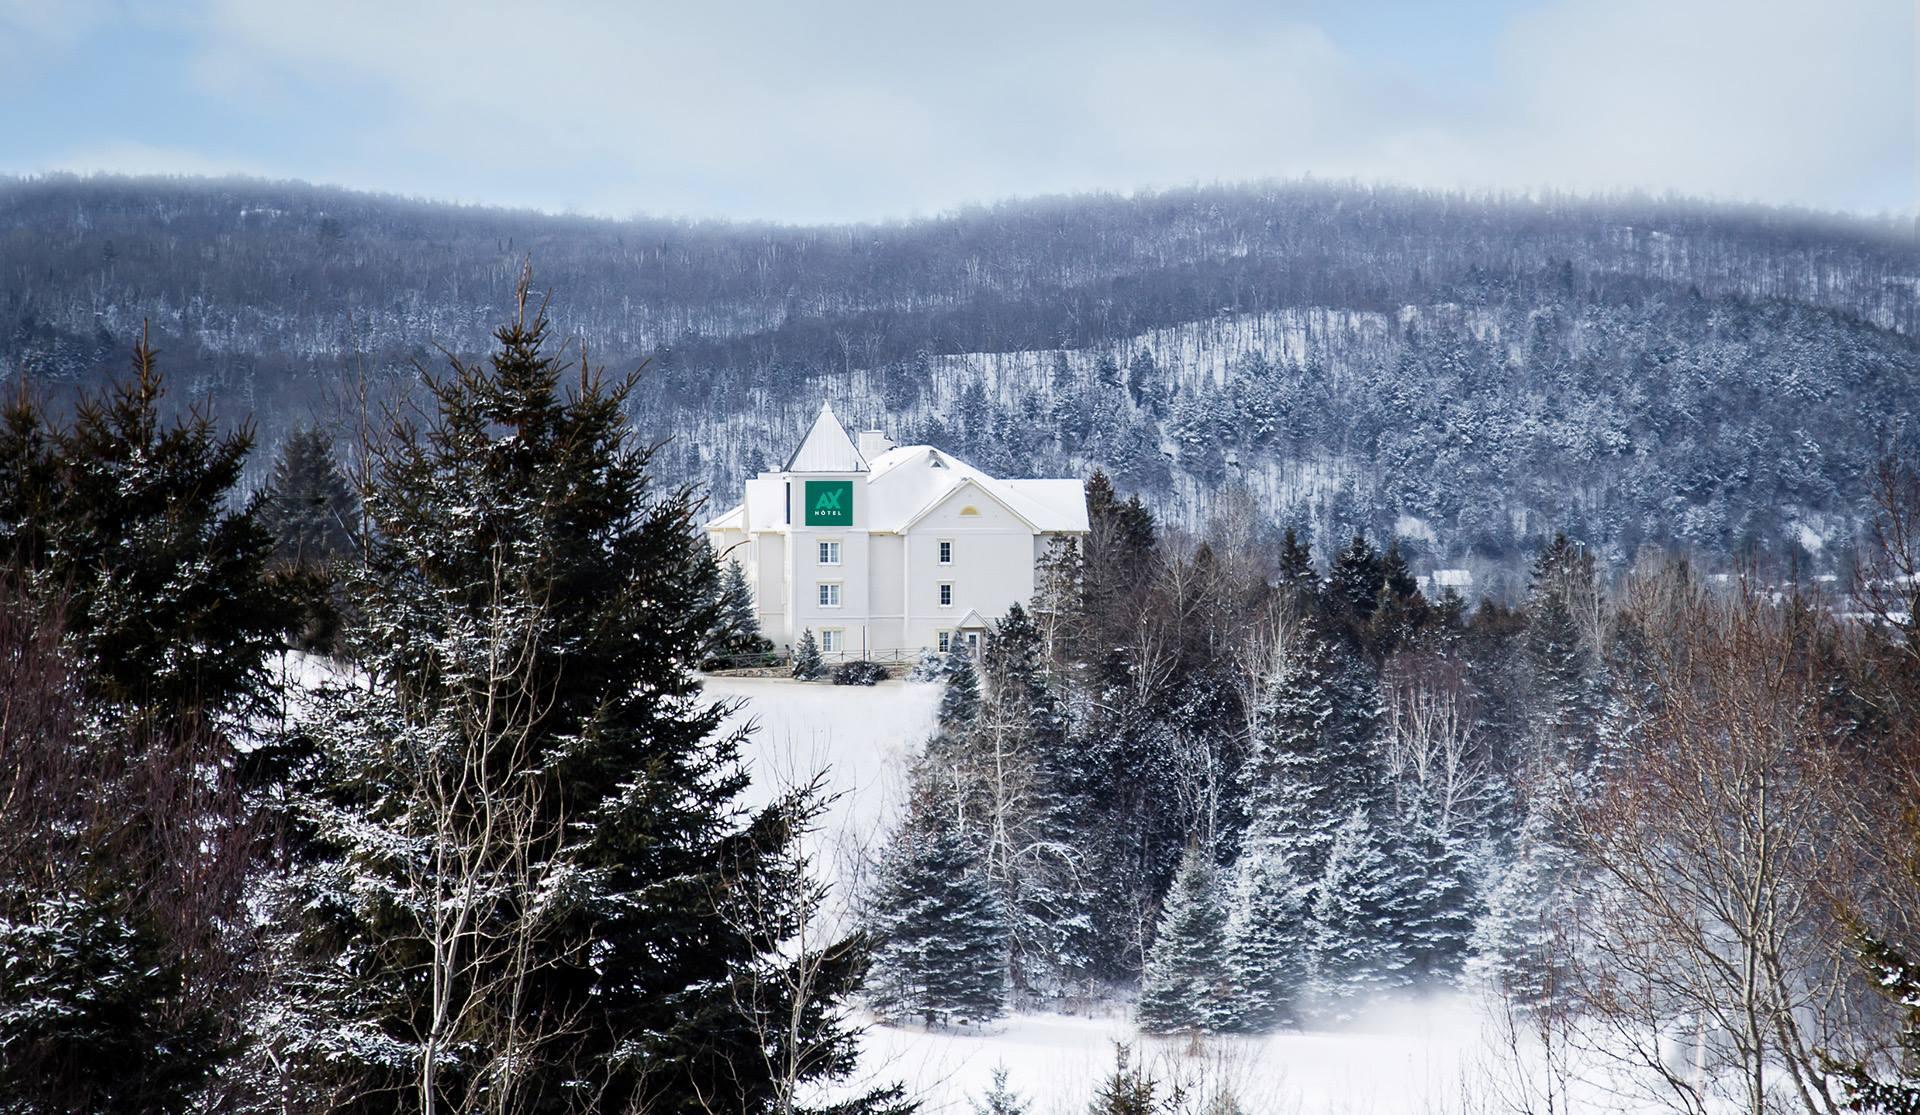 Hôtel gay du Mont-Tremblant